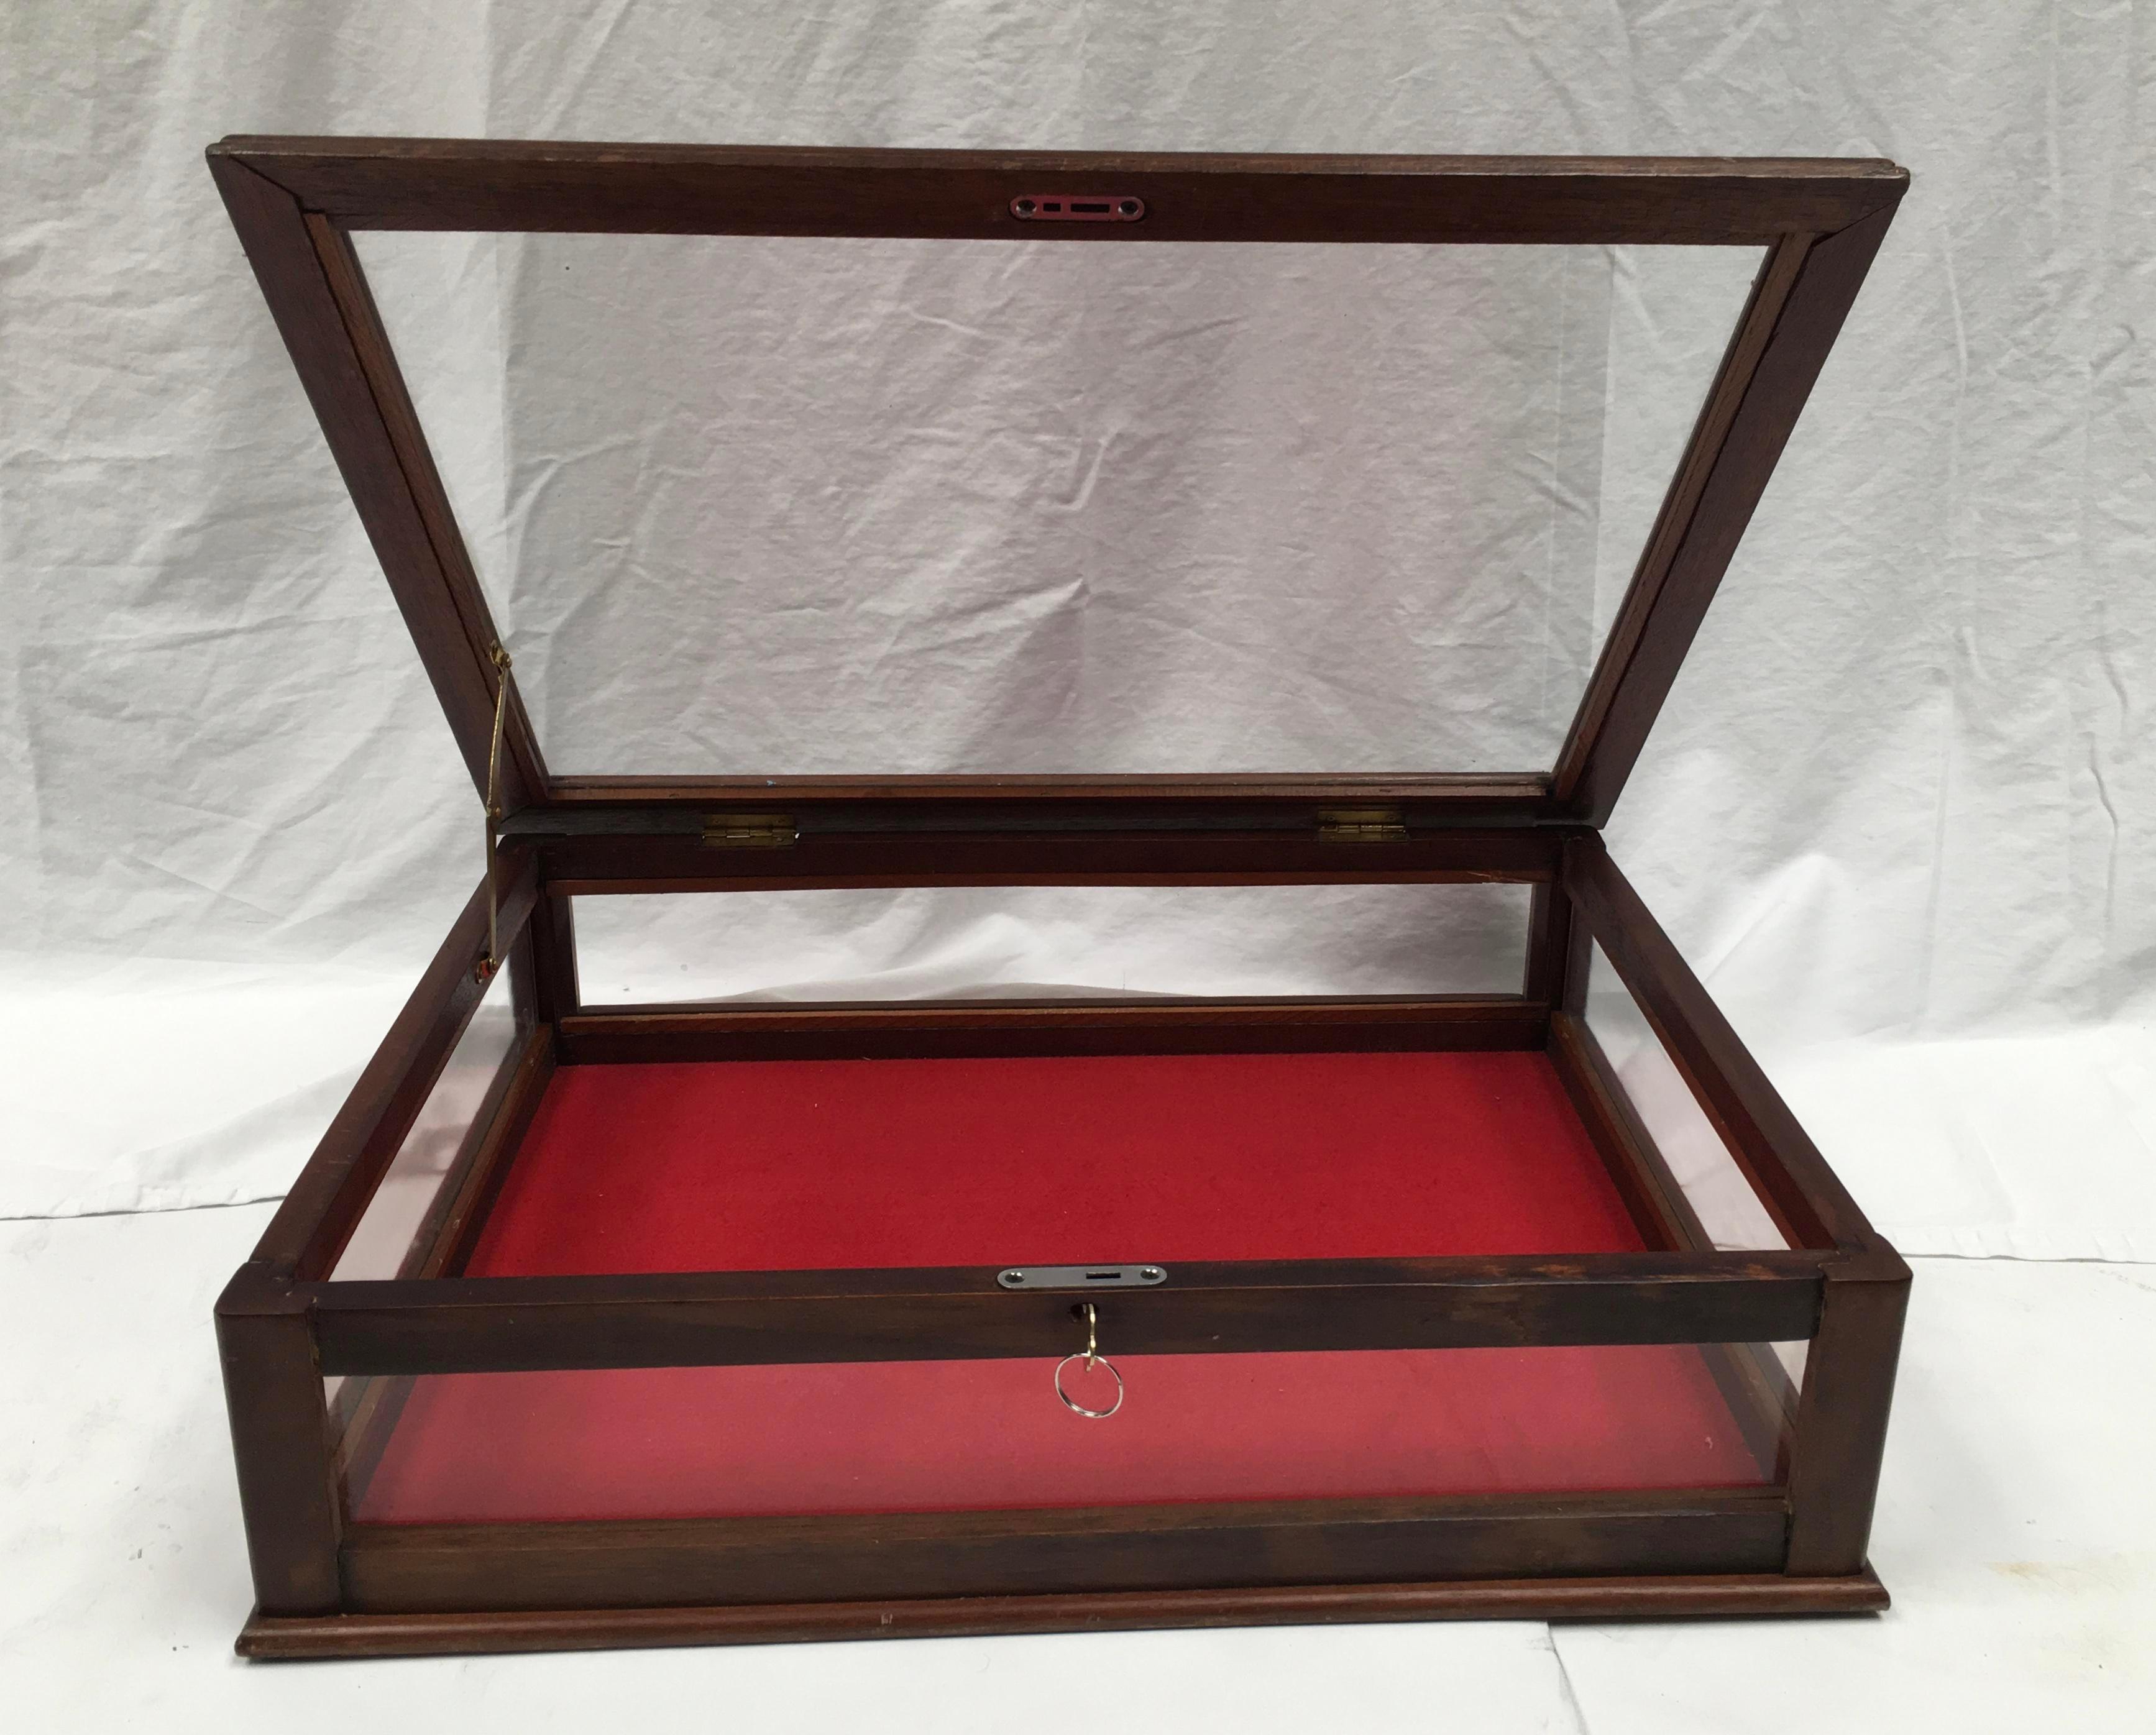 Vintage Mahogany U0026 Glass Tabletop Display Case   Image 4 ...